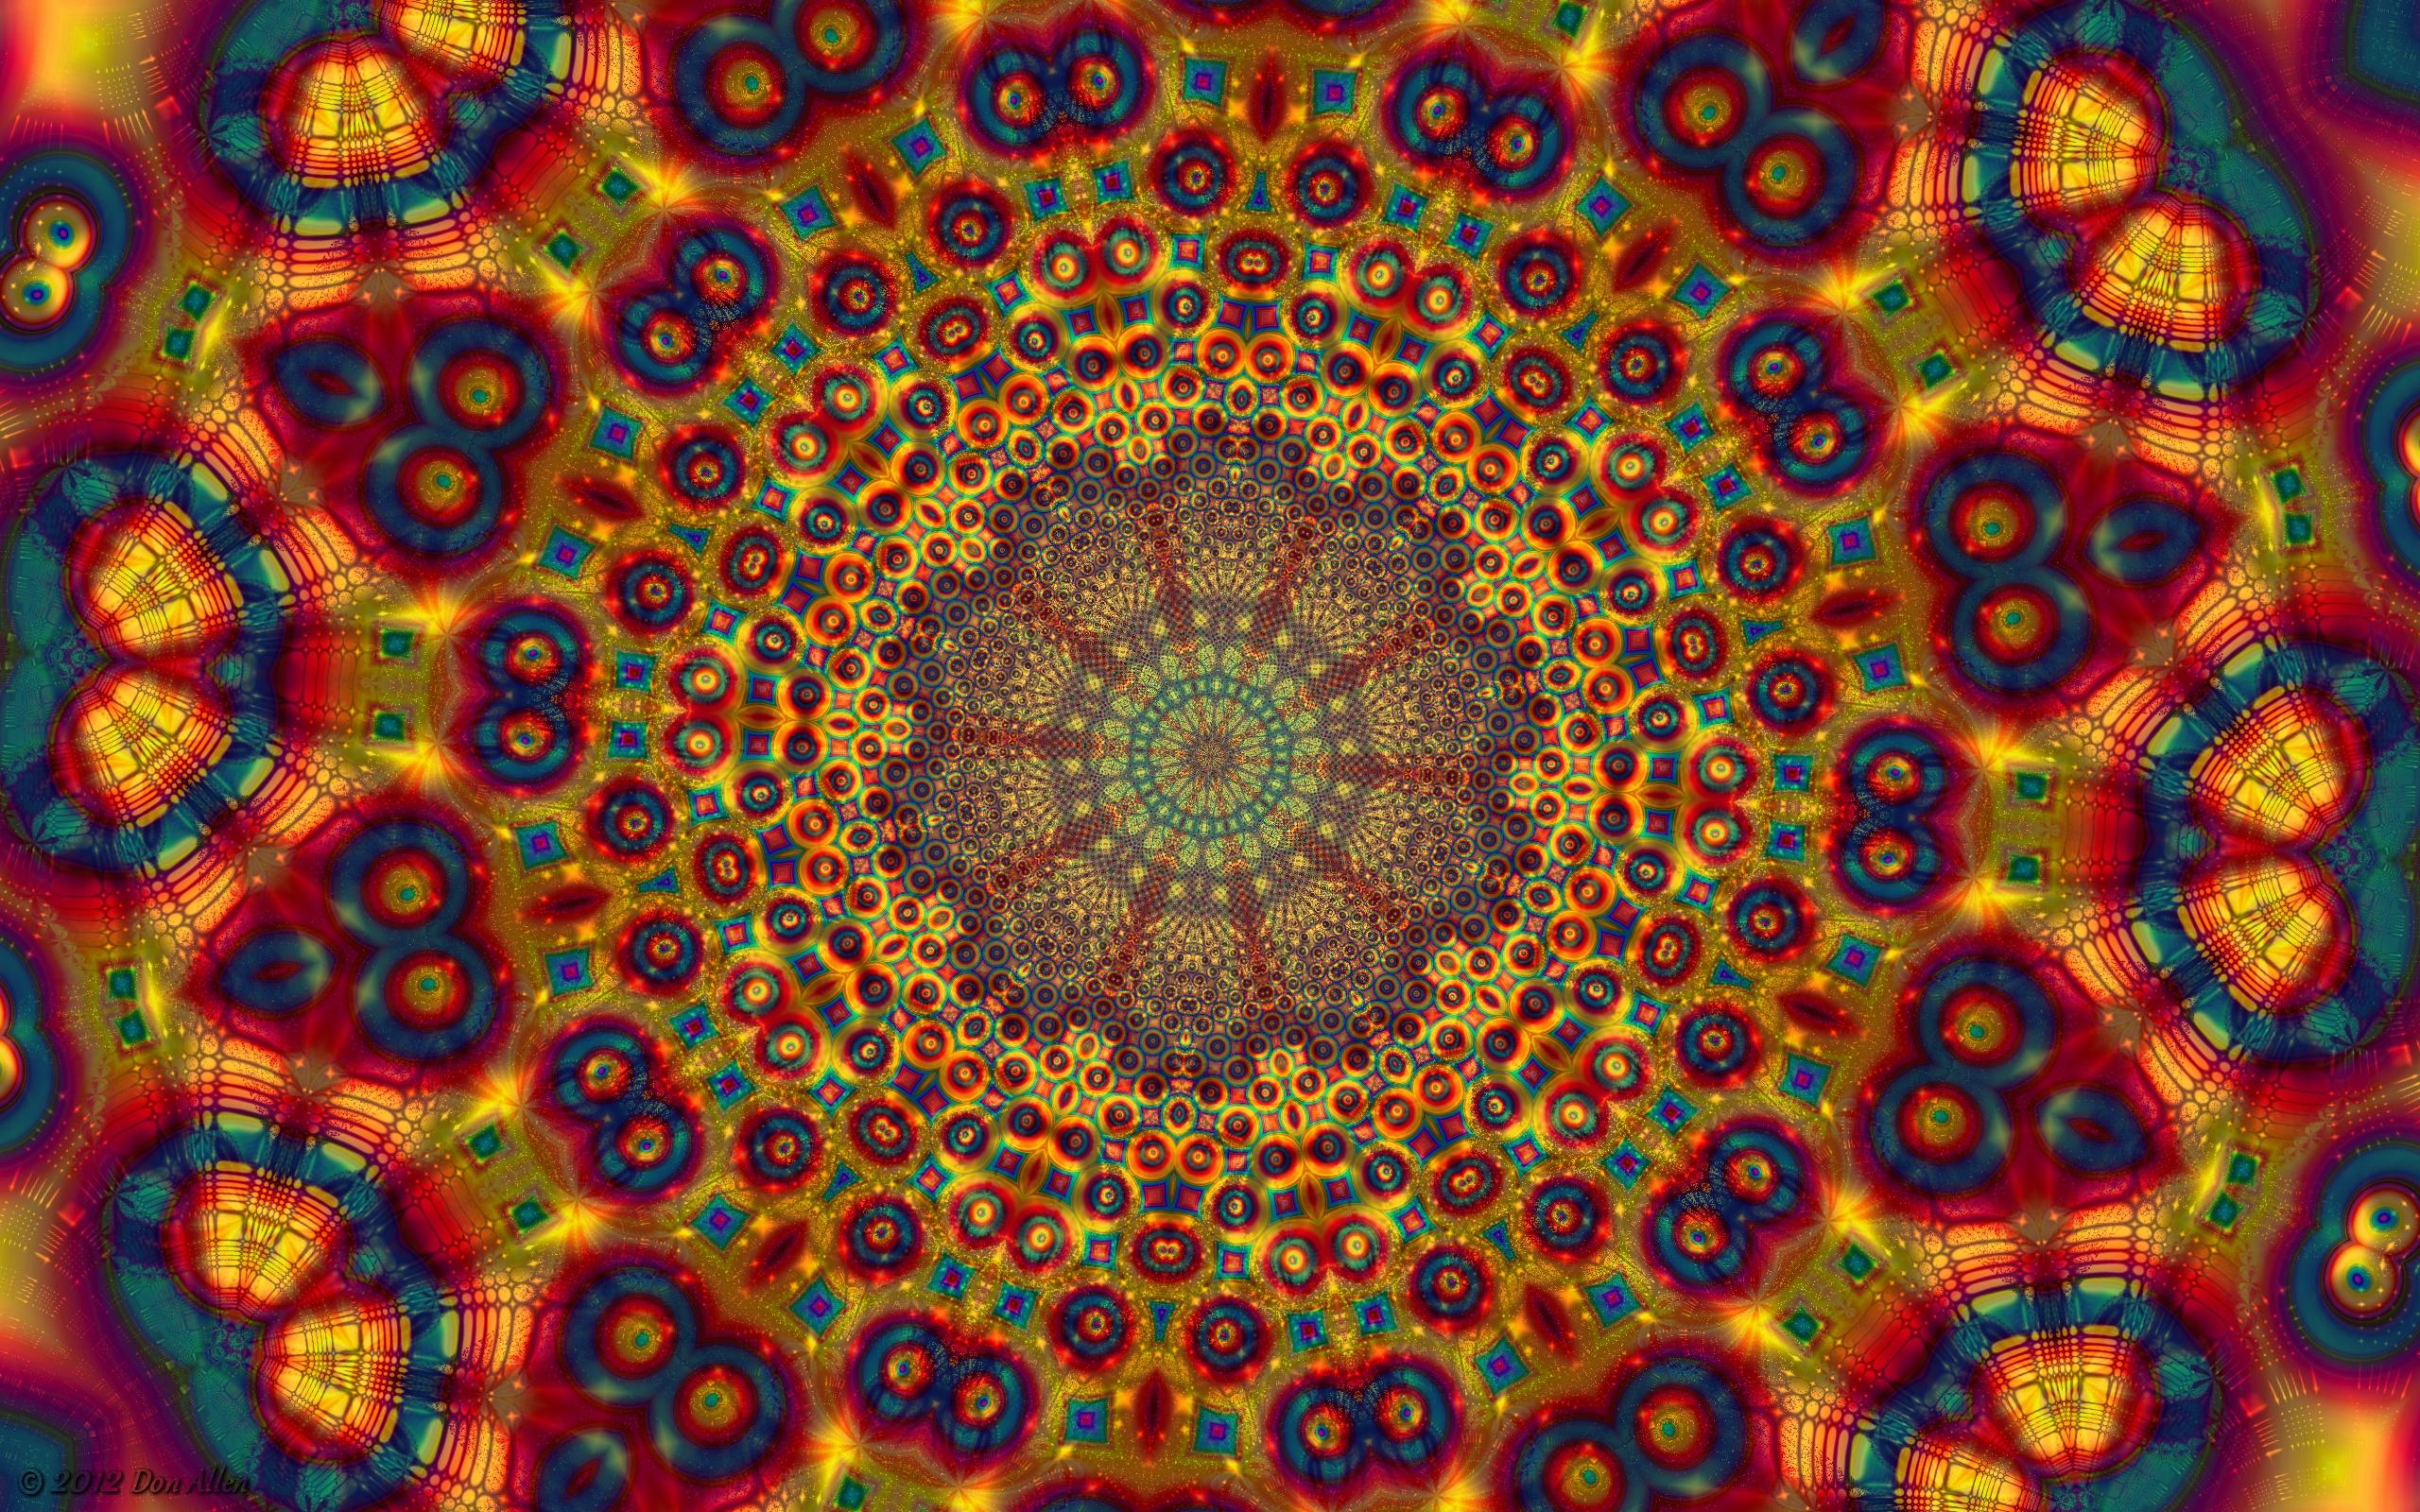 800x600 desk fractal mandala pc top